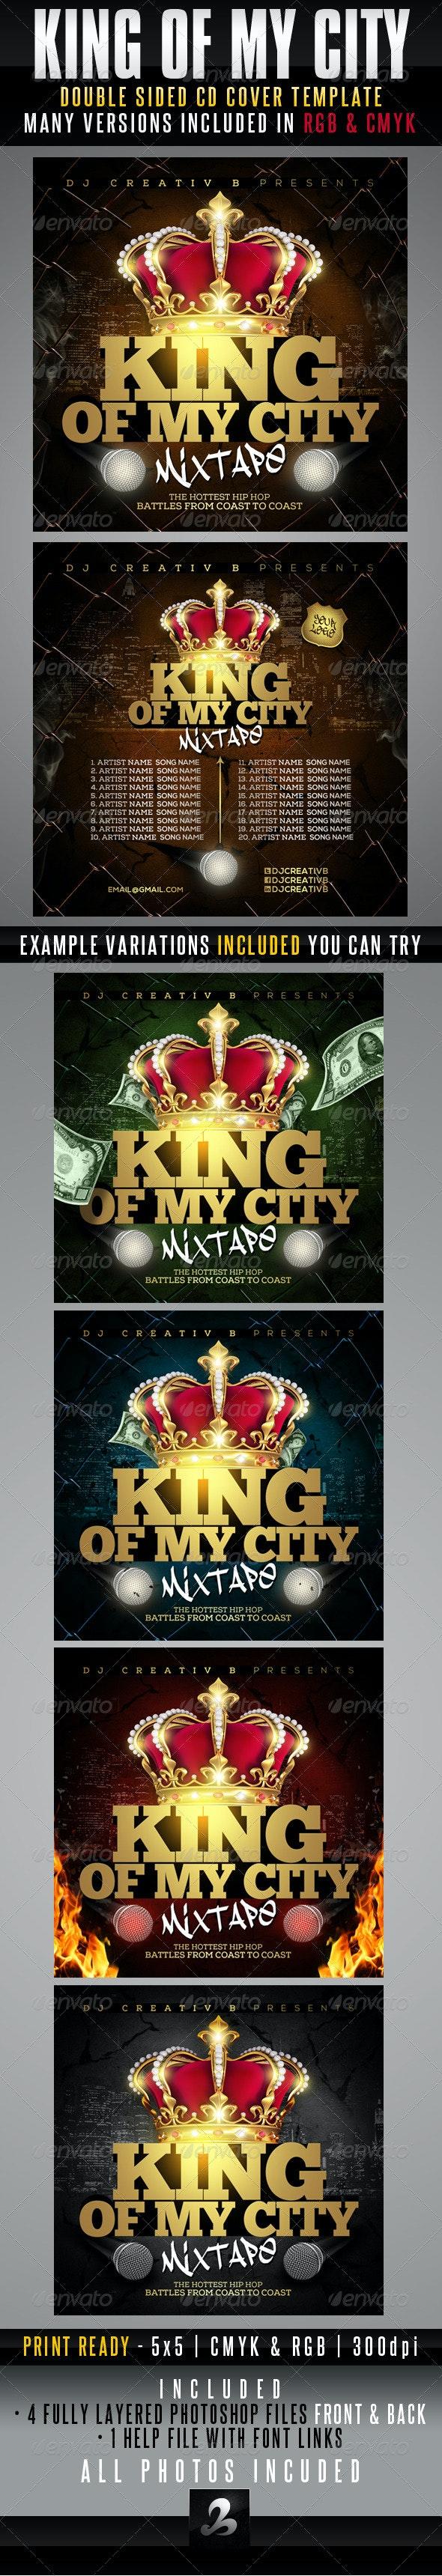 King Of My City Mixtape CD Cover Template - CD & DVD Artwork Print Templates